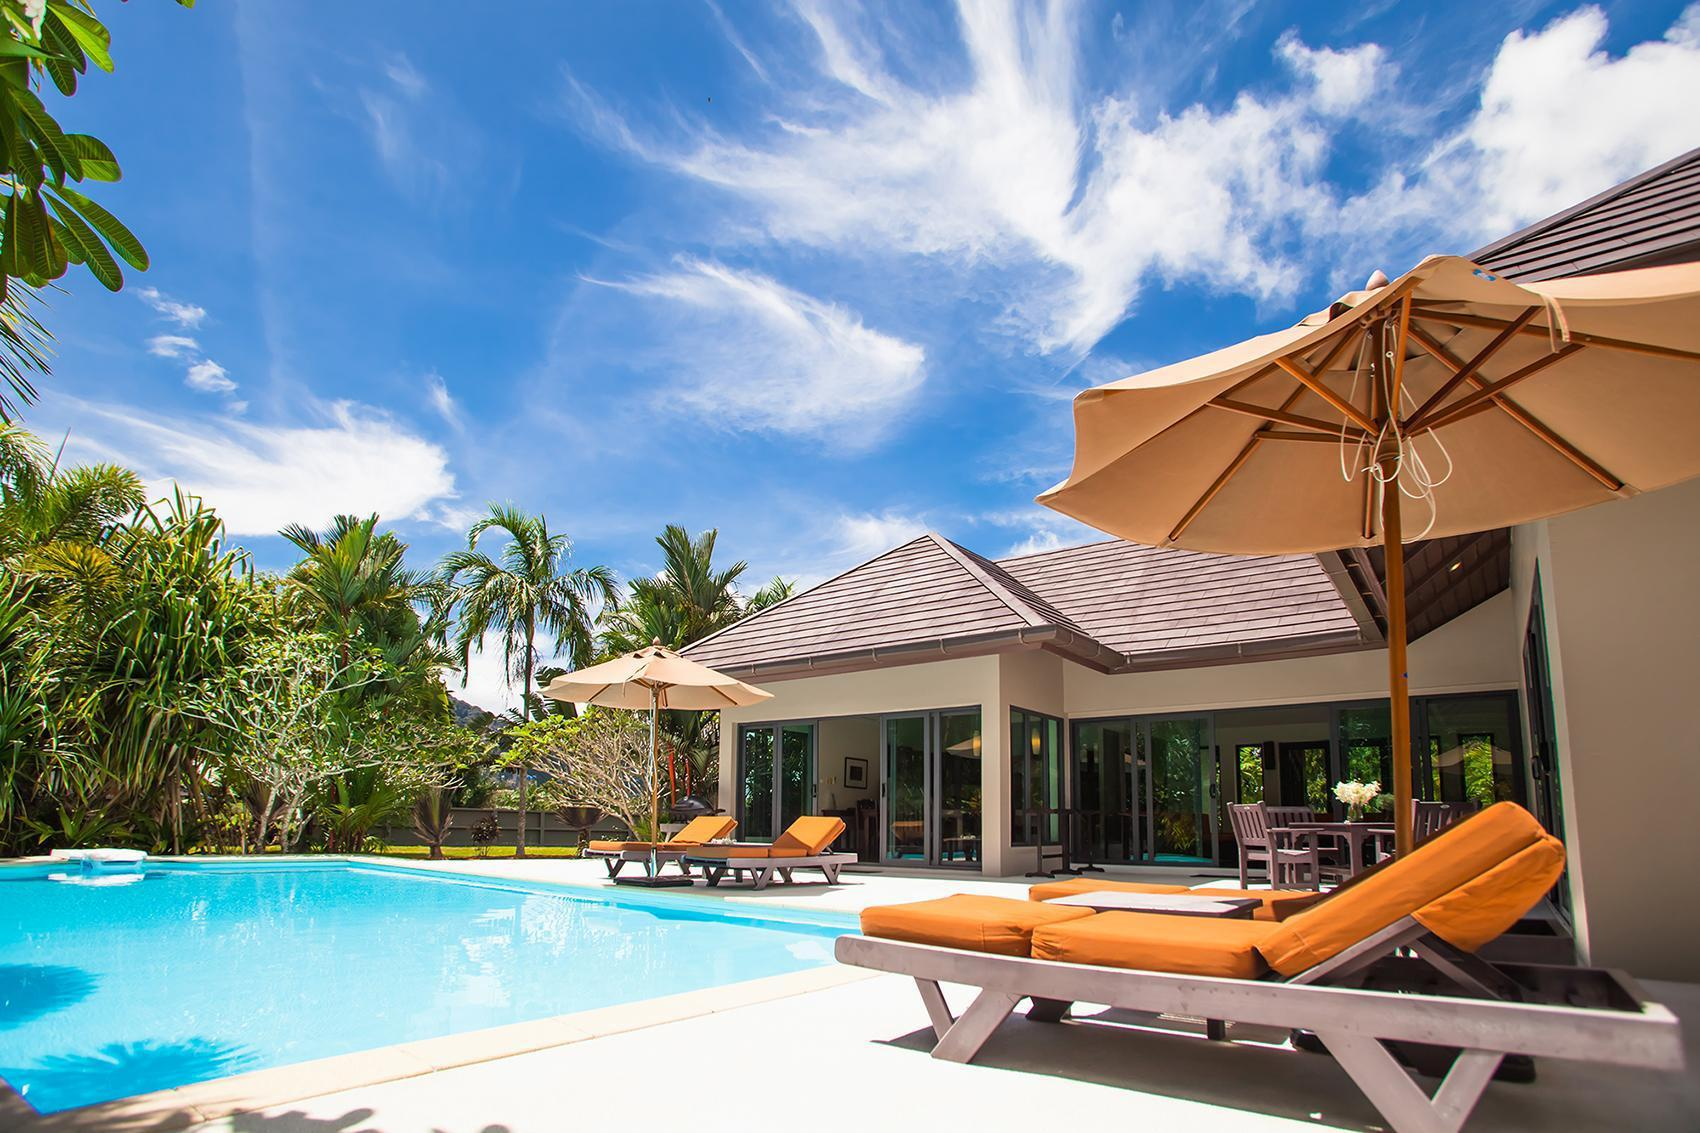 Baan Malisa Luxury Private Pool Villa บ้านมะลิษา ลักชัวรี ไพรเวทพูล วิลลา